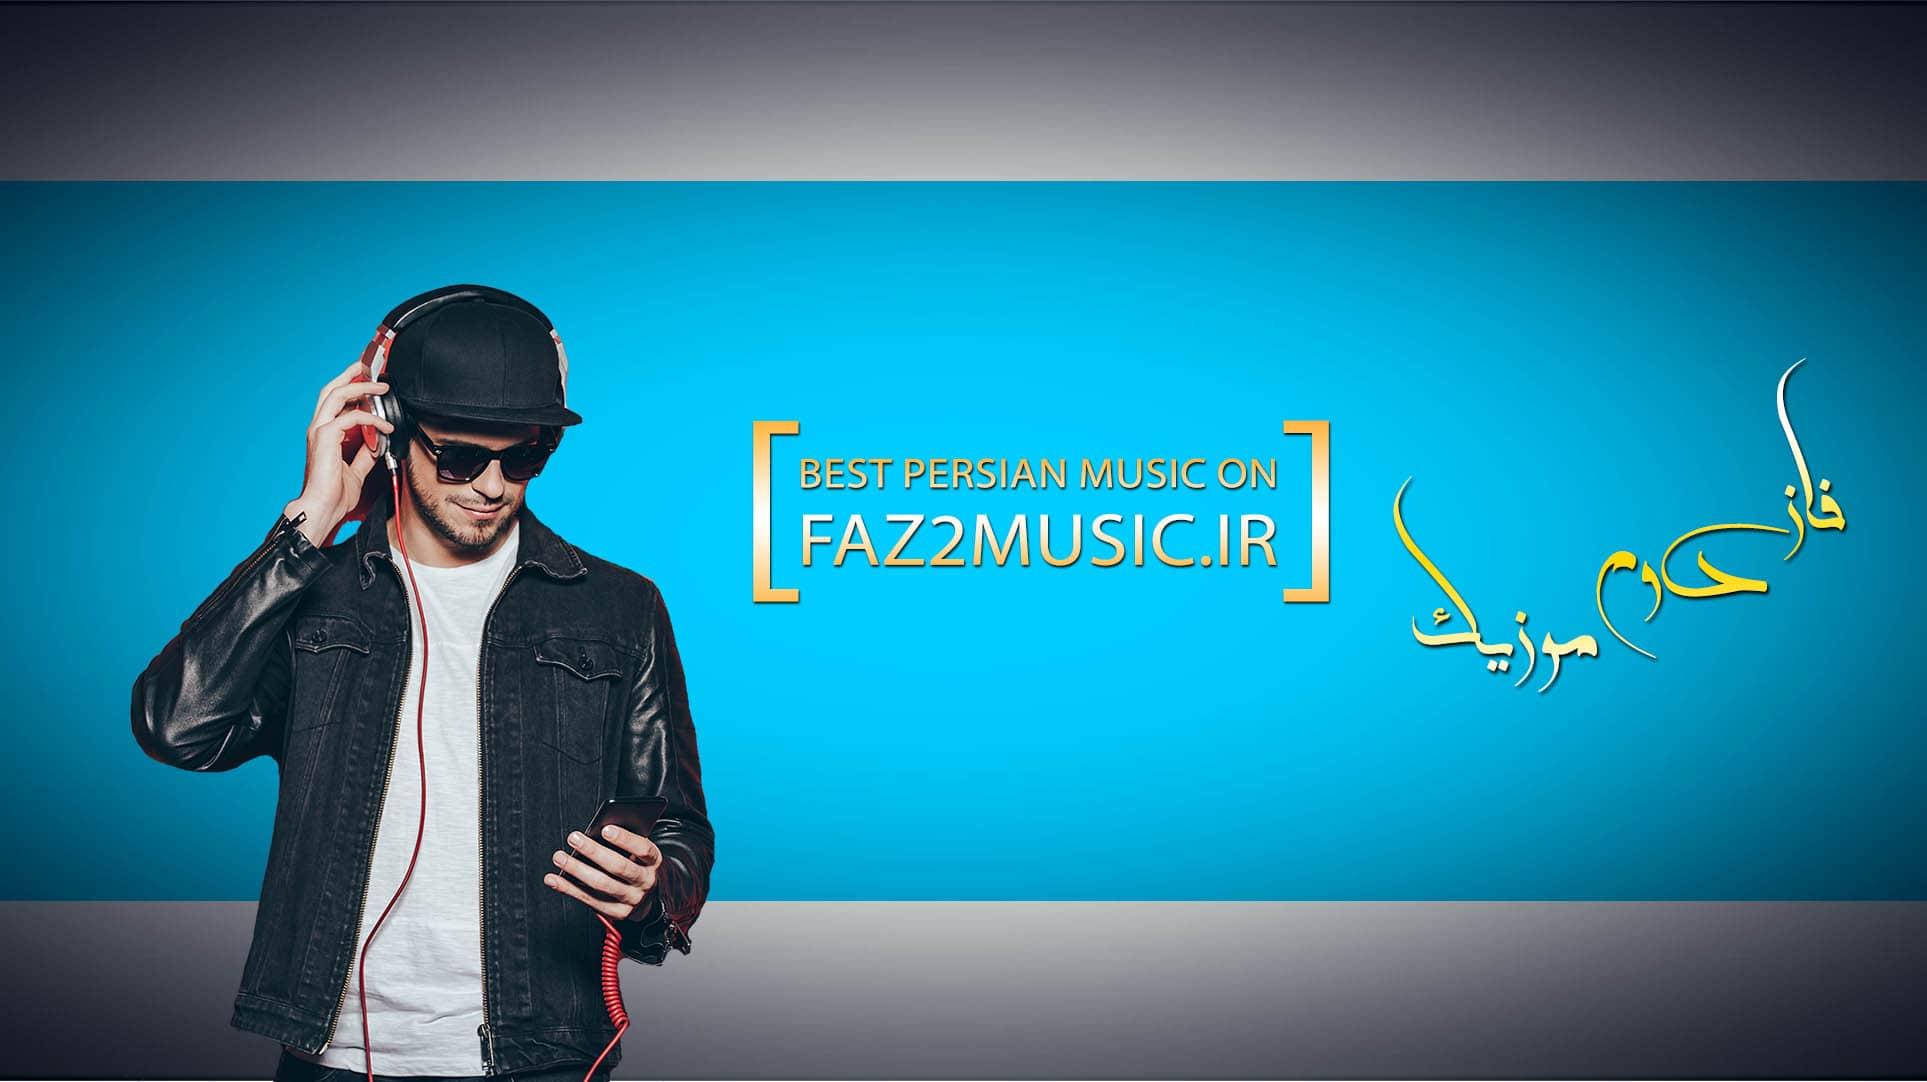 Faz2music.ir